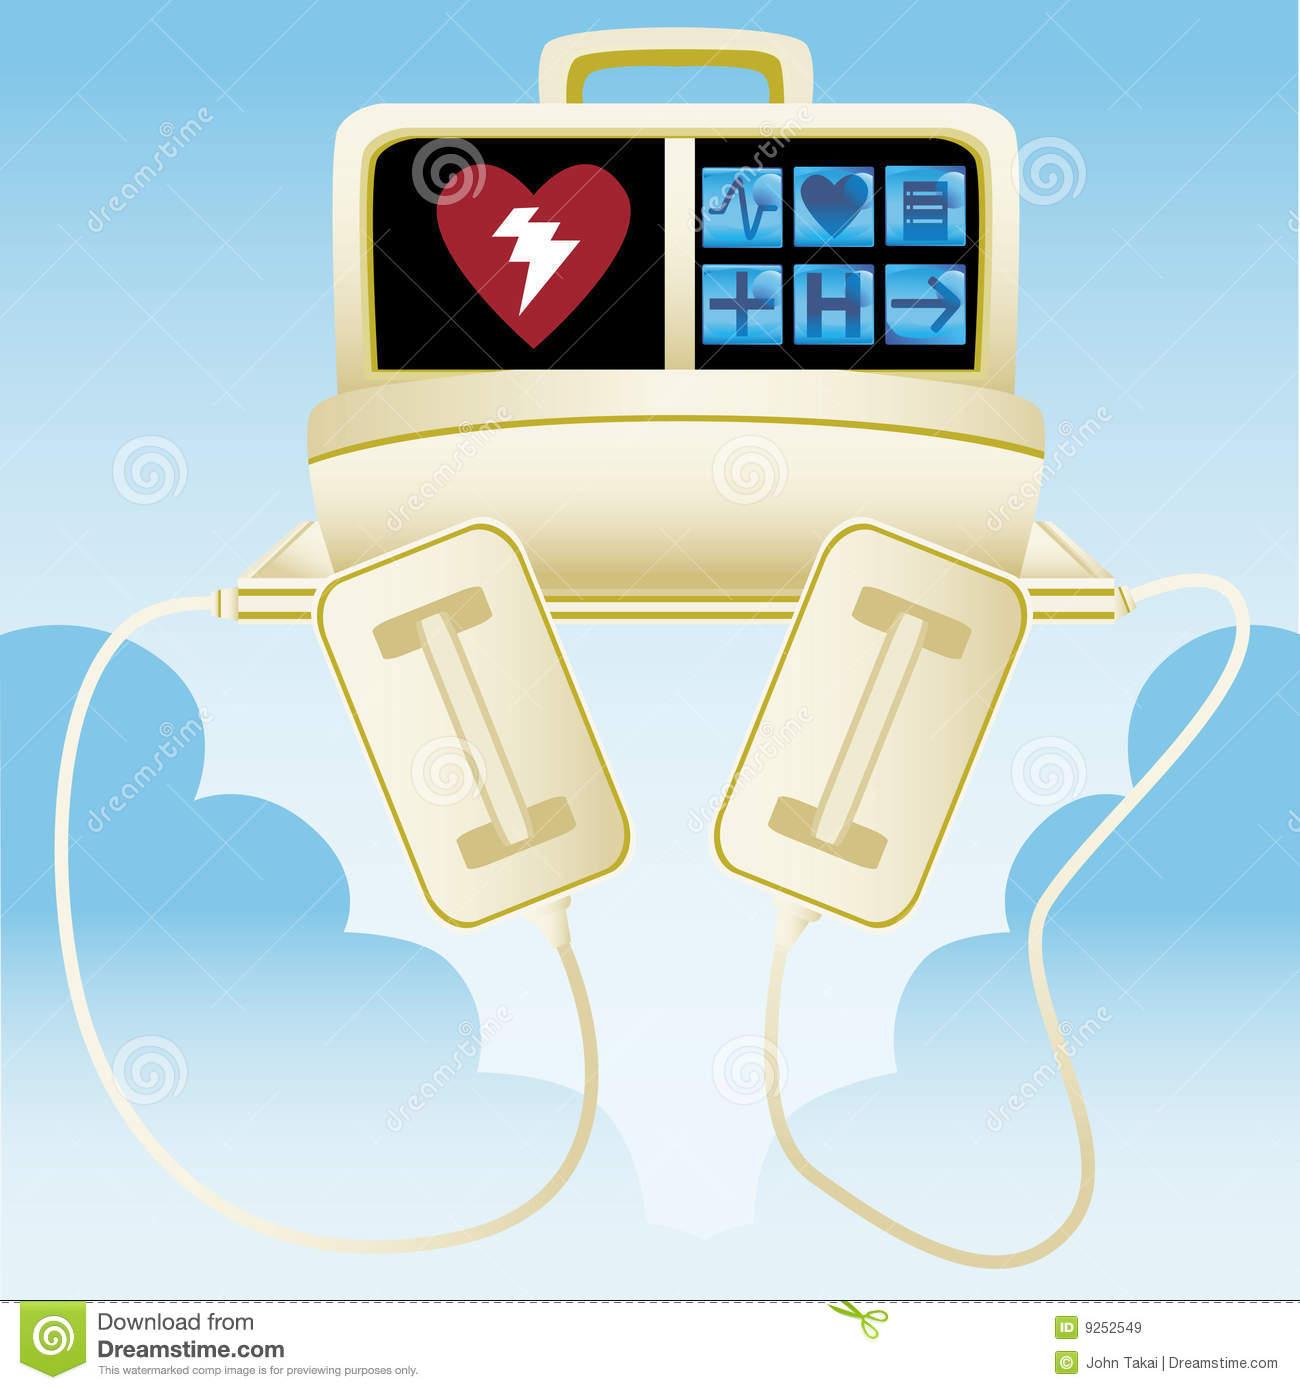 Heart Defibrillator Clip Art.